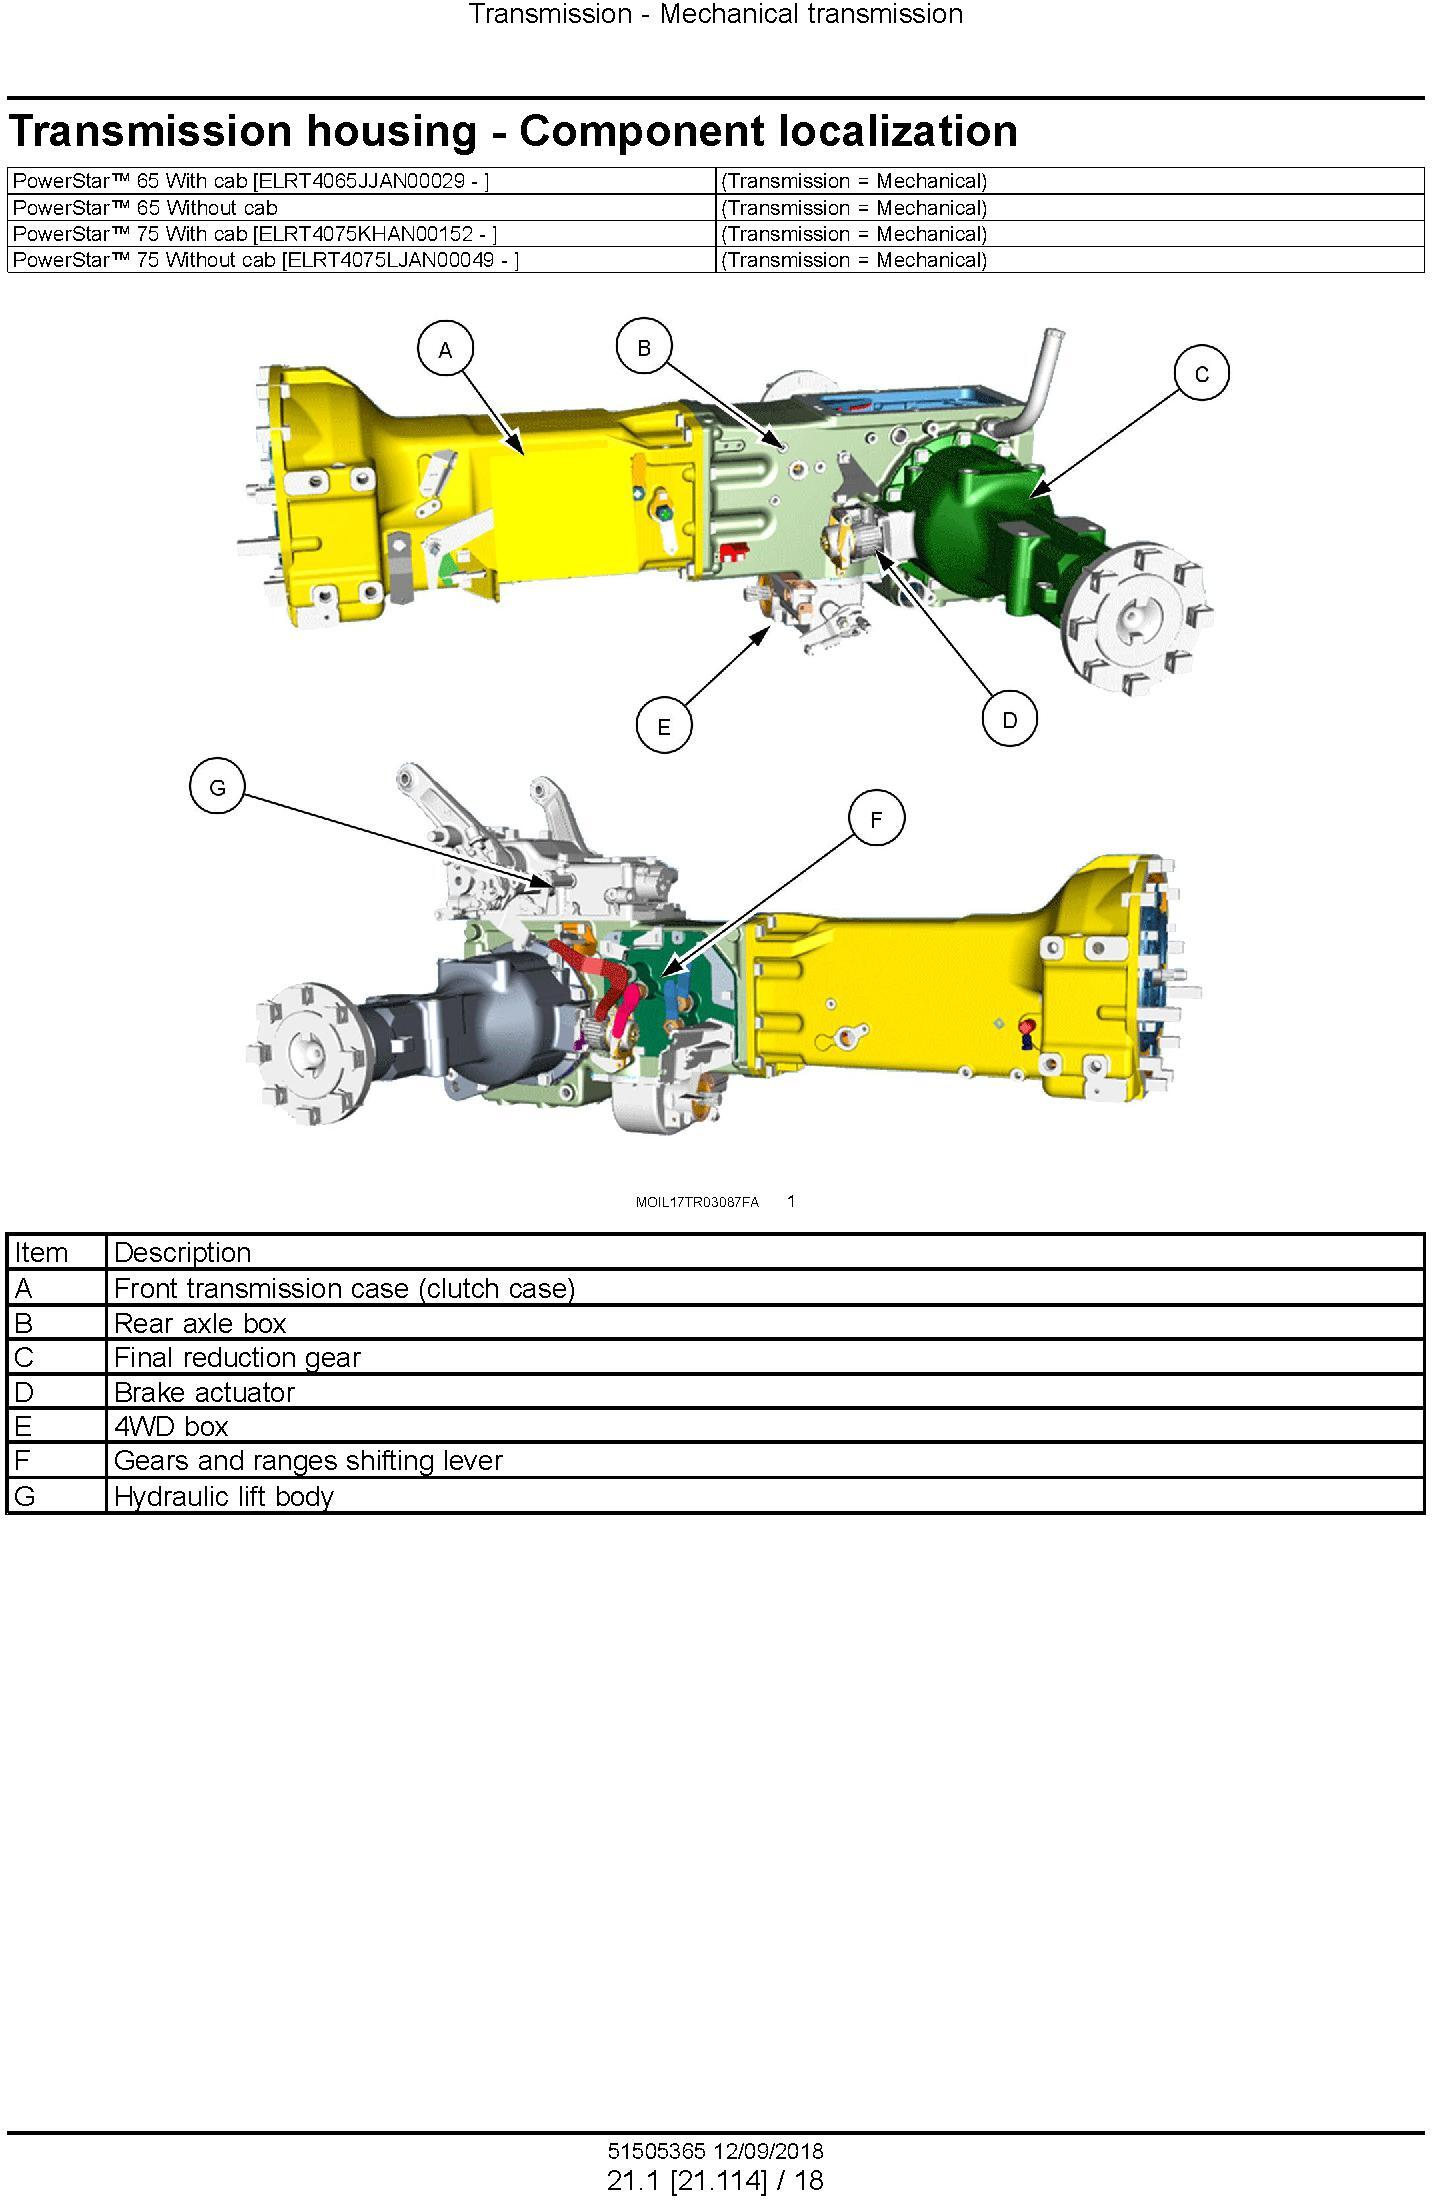 New Holland PowerStar 65, PowerStar 75 Tier 4B final Tractor Service Manual (North America) - 2